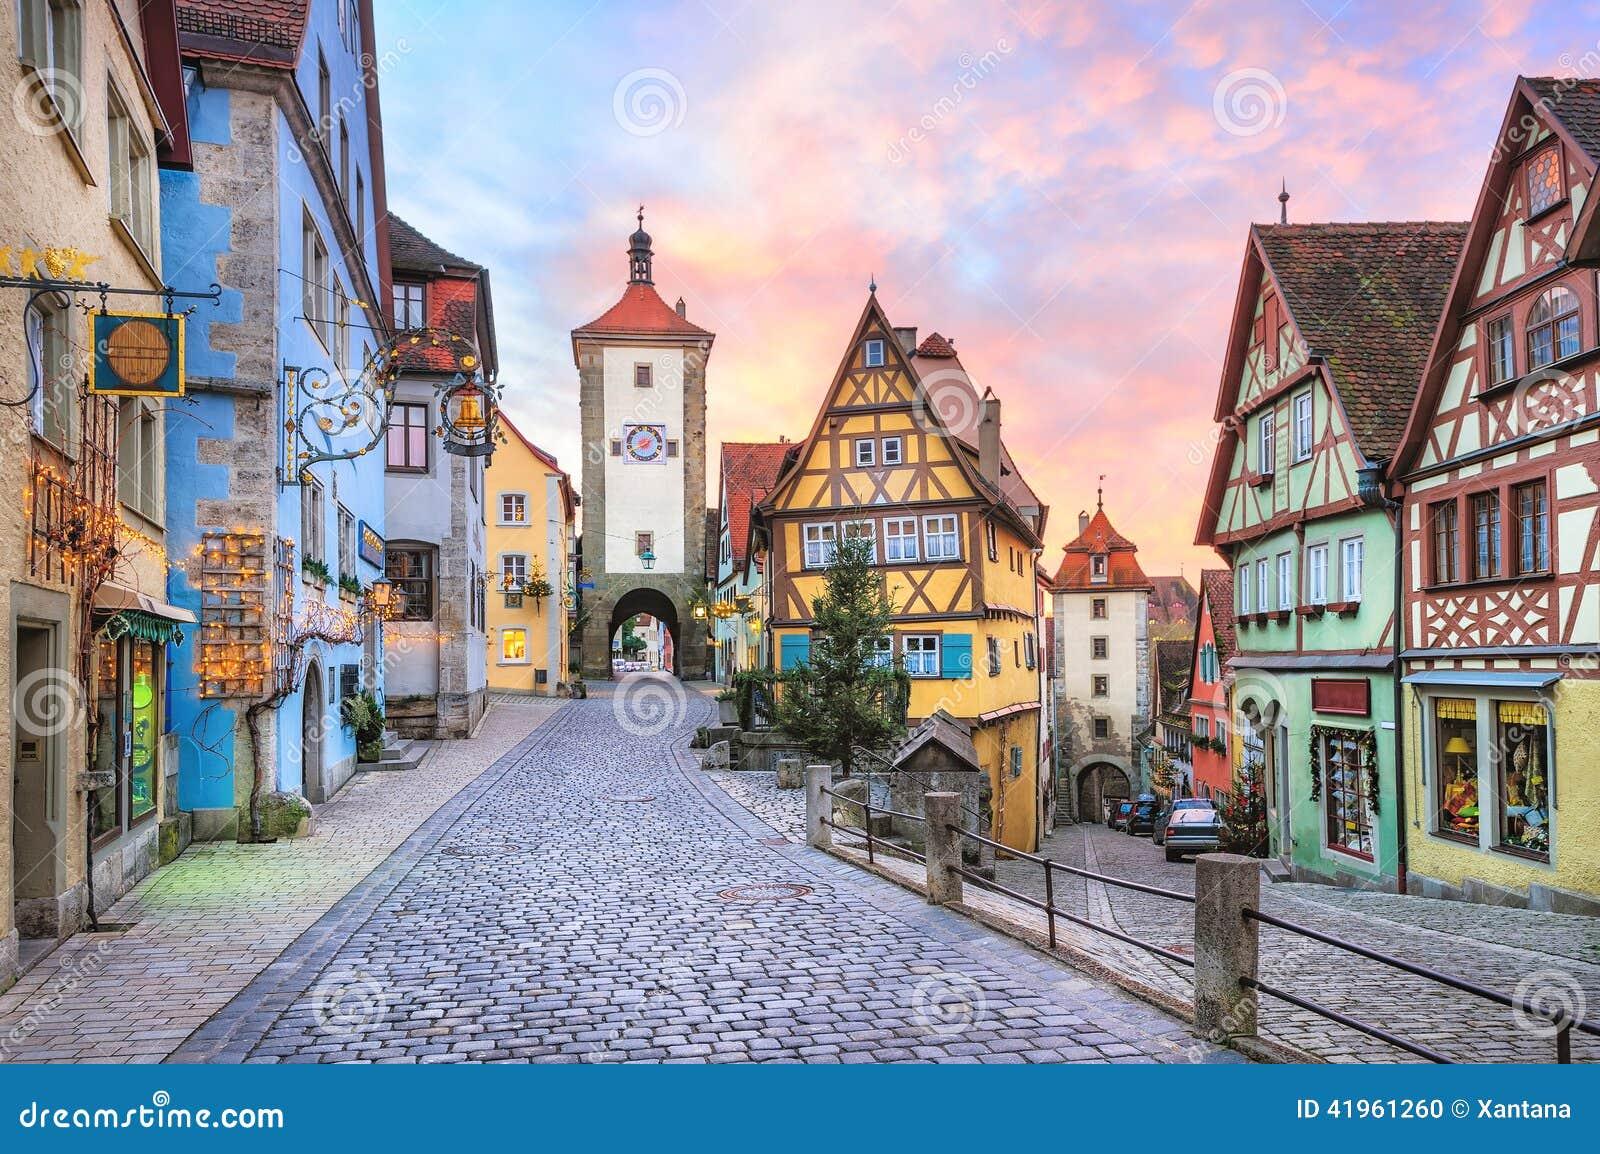 Rothenburg Ob Der Tauber Germany Stock Photo Image